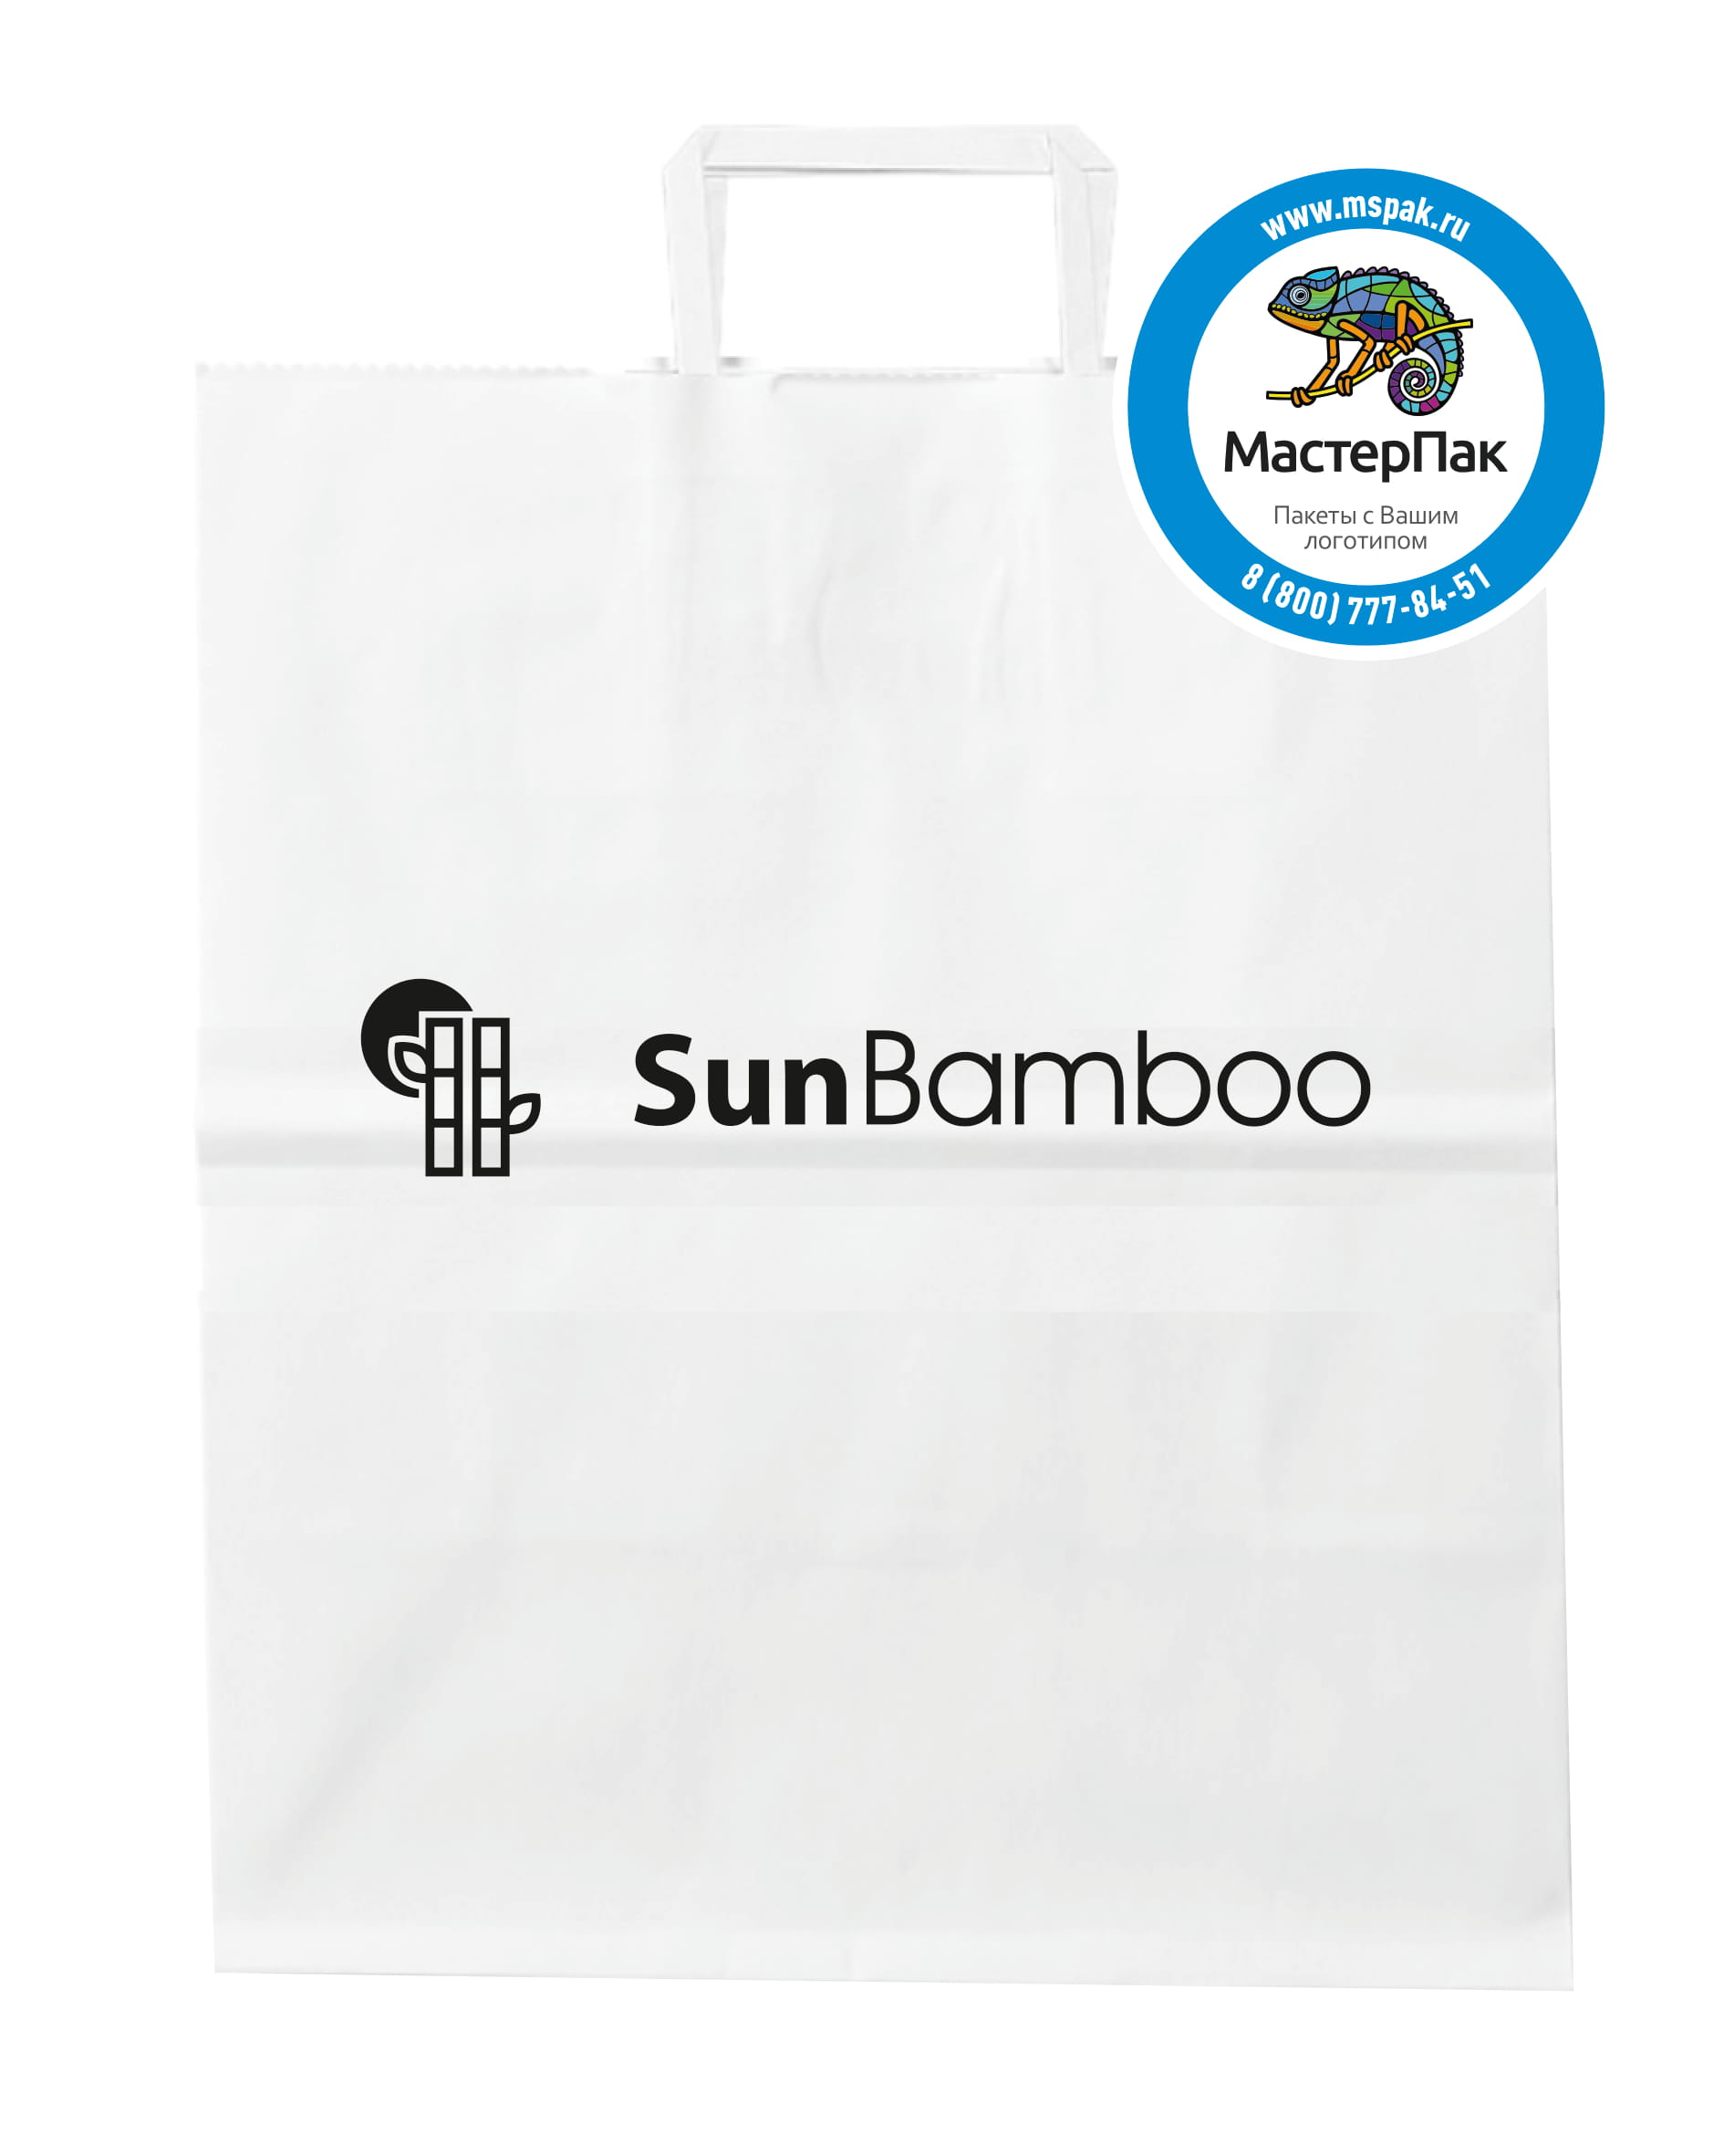 Пакет крафт, бумажный с логотипом Sun Bamboo, Улад-Удэ, 24*28 см